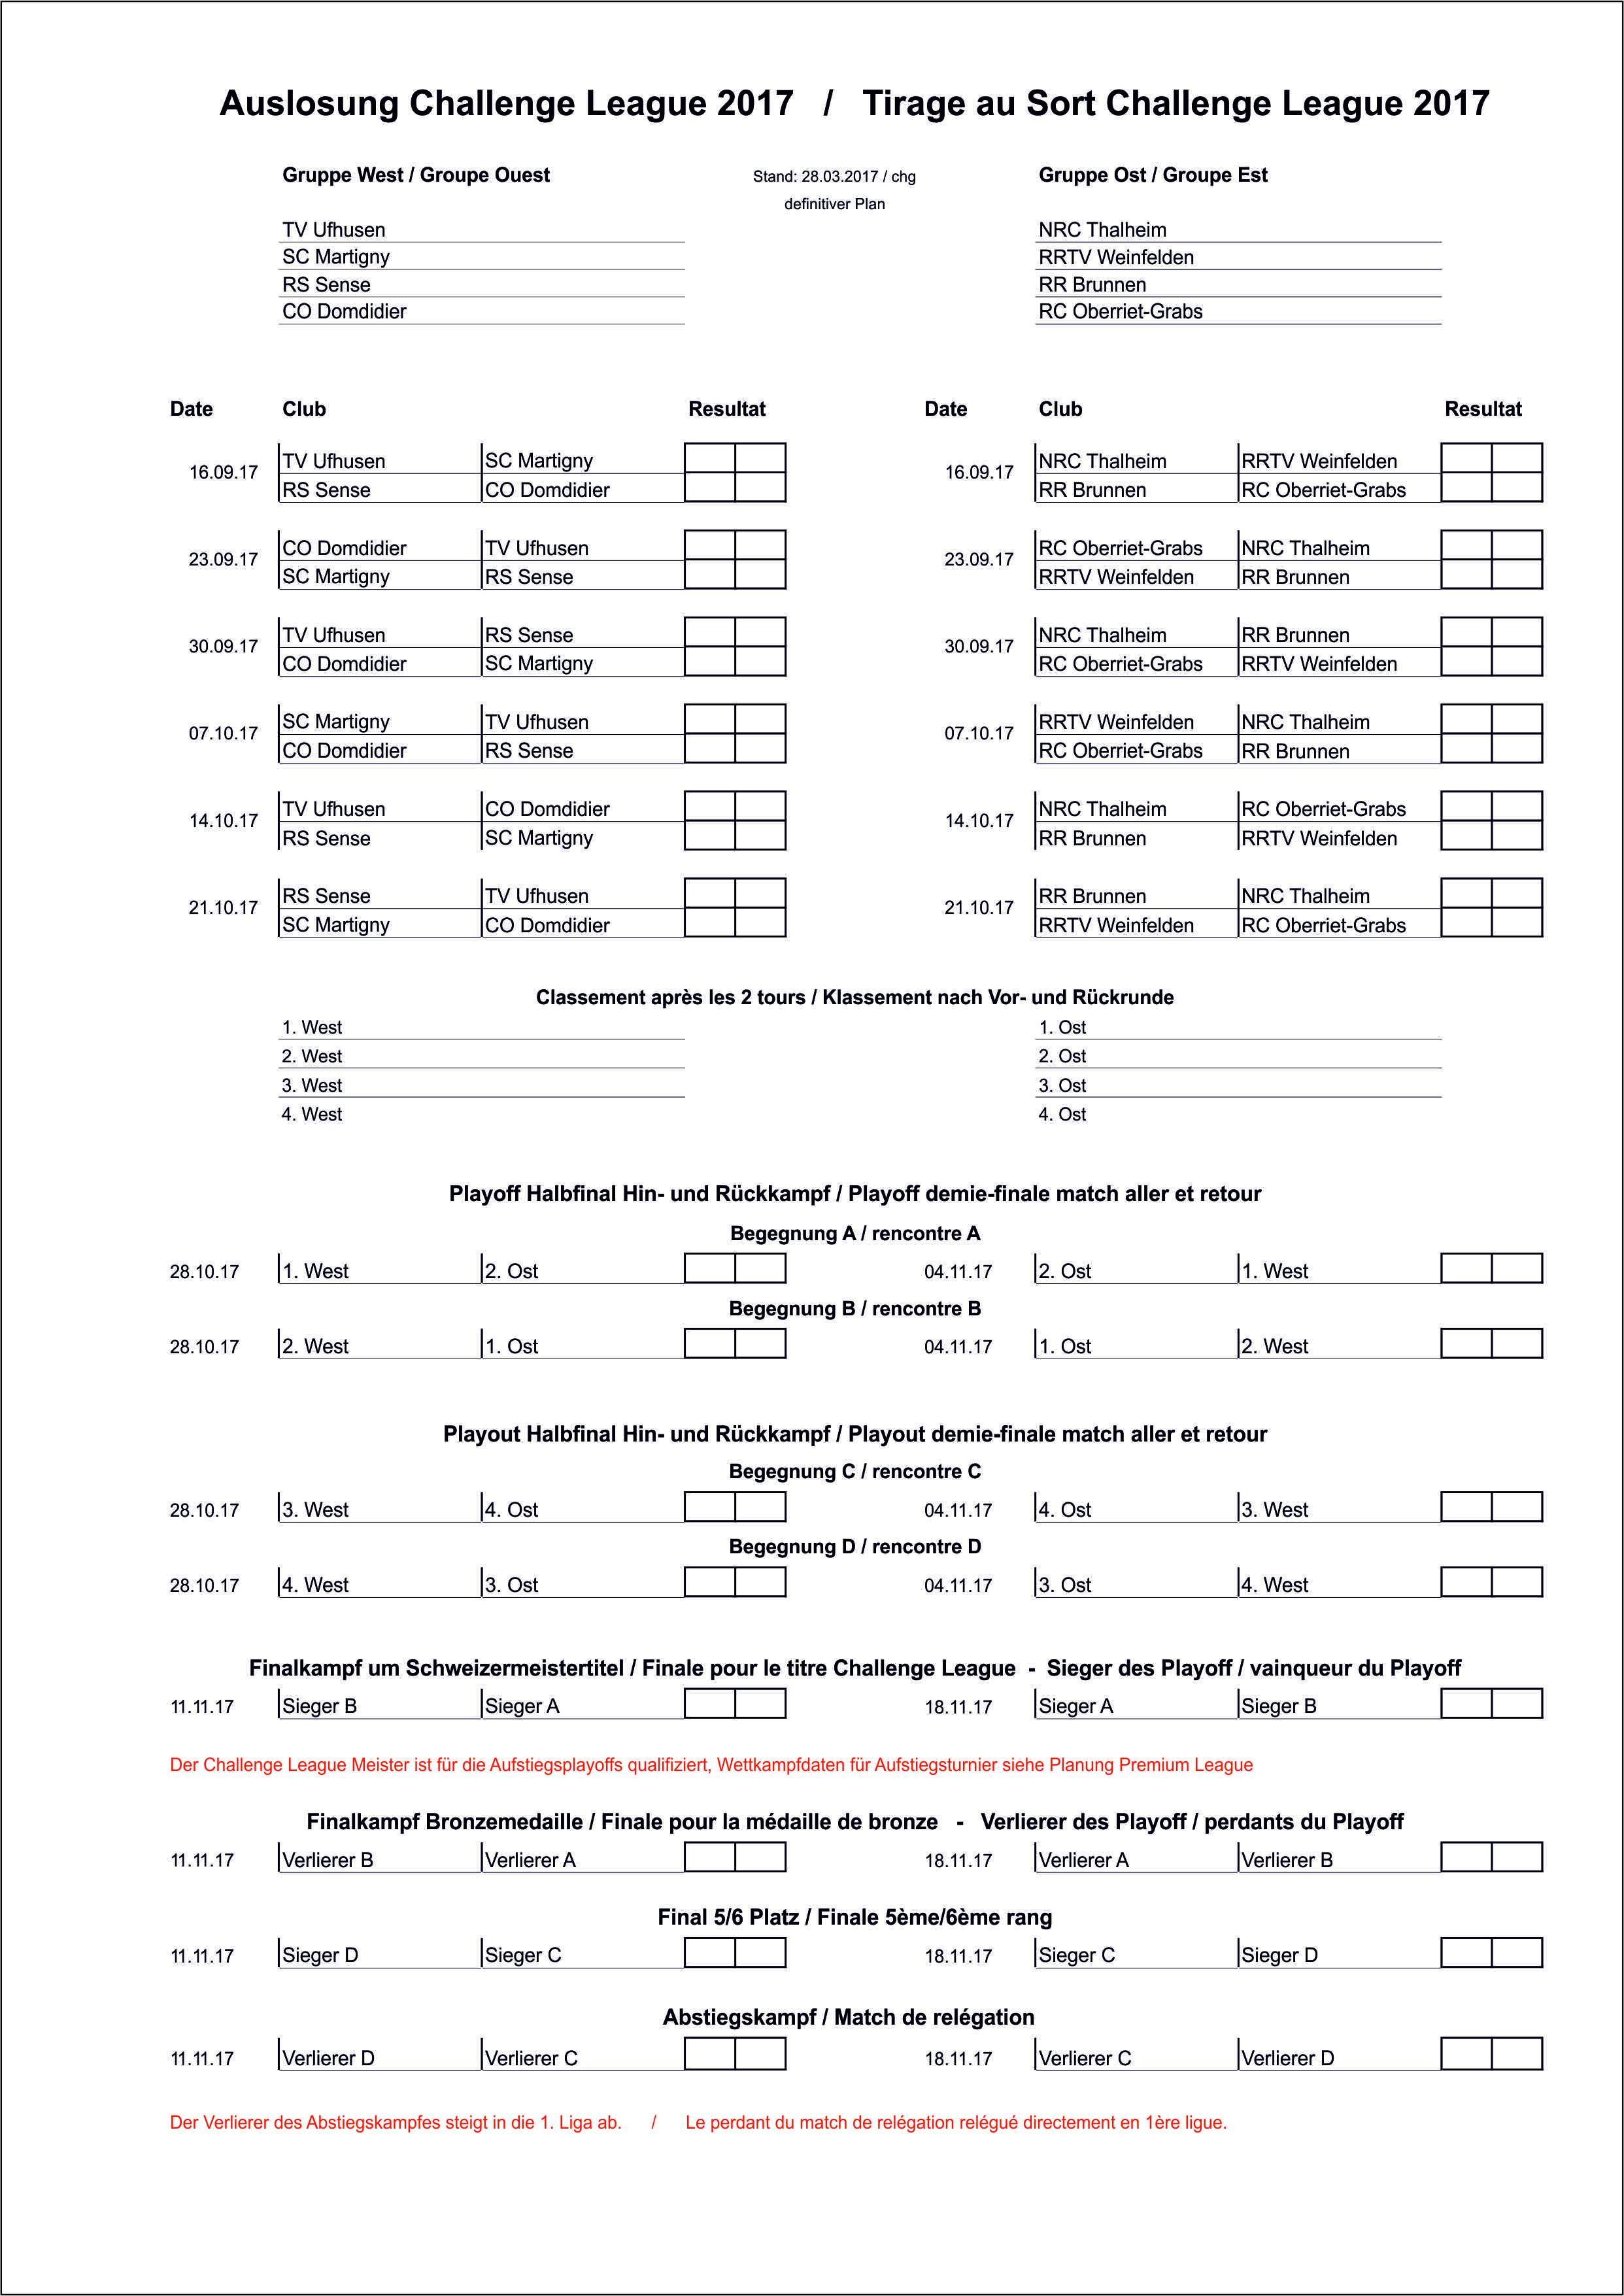 Calendrier - Kalender WINFORCE Challenge League 2017_definitiv